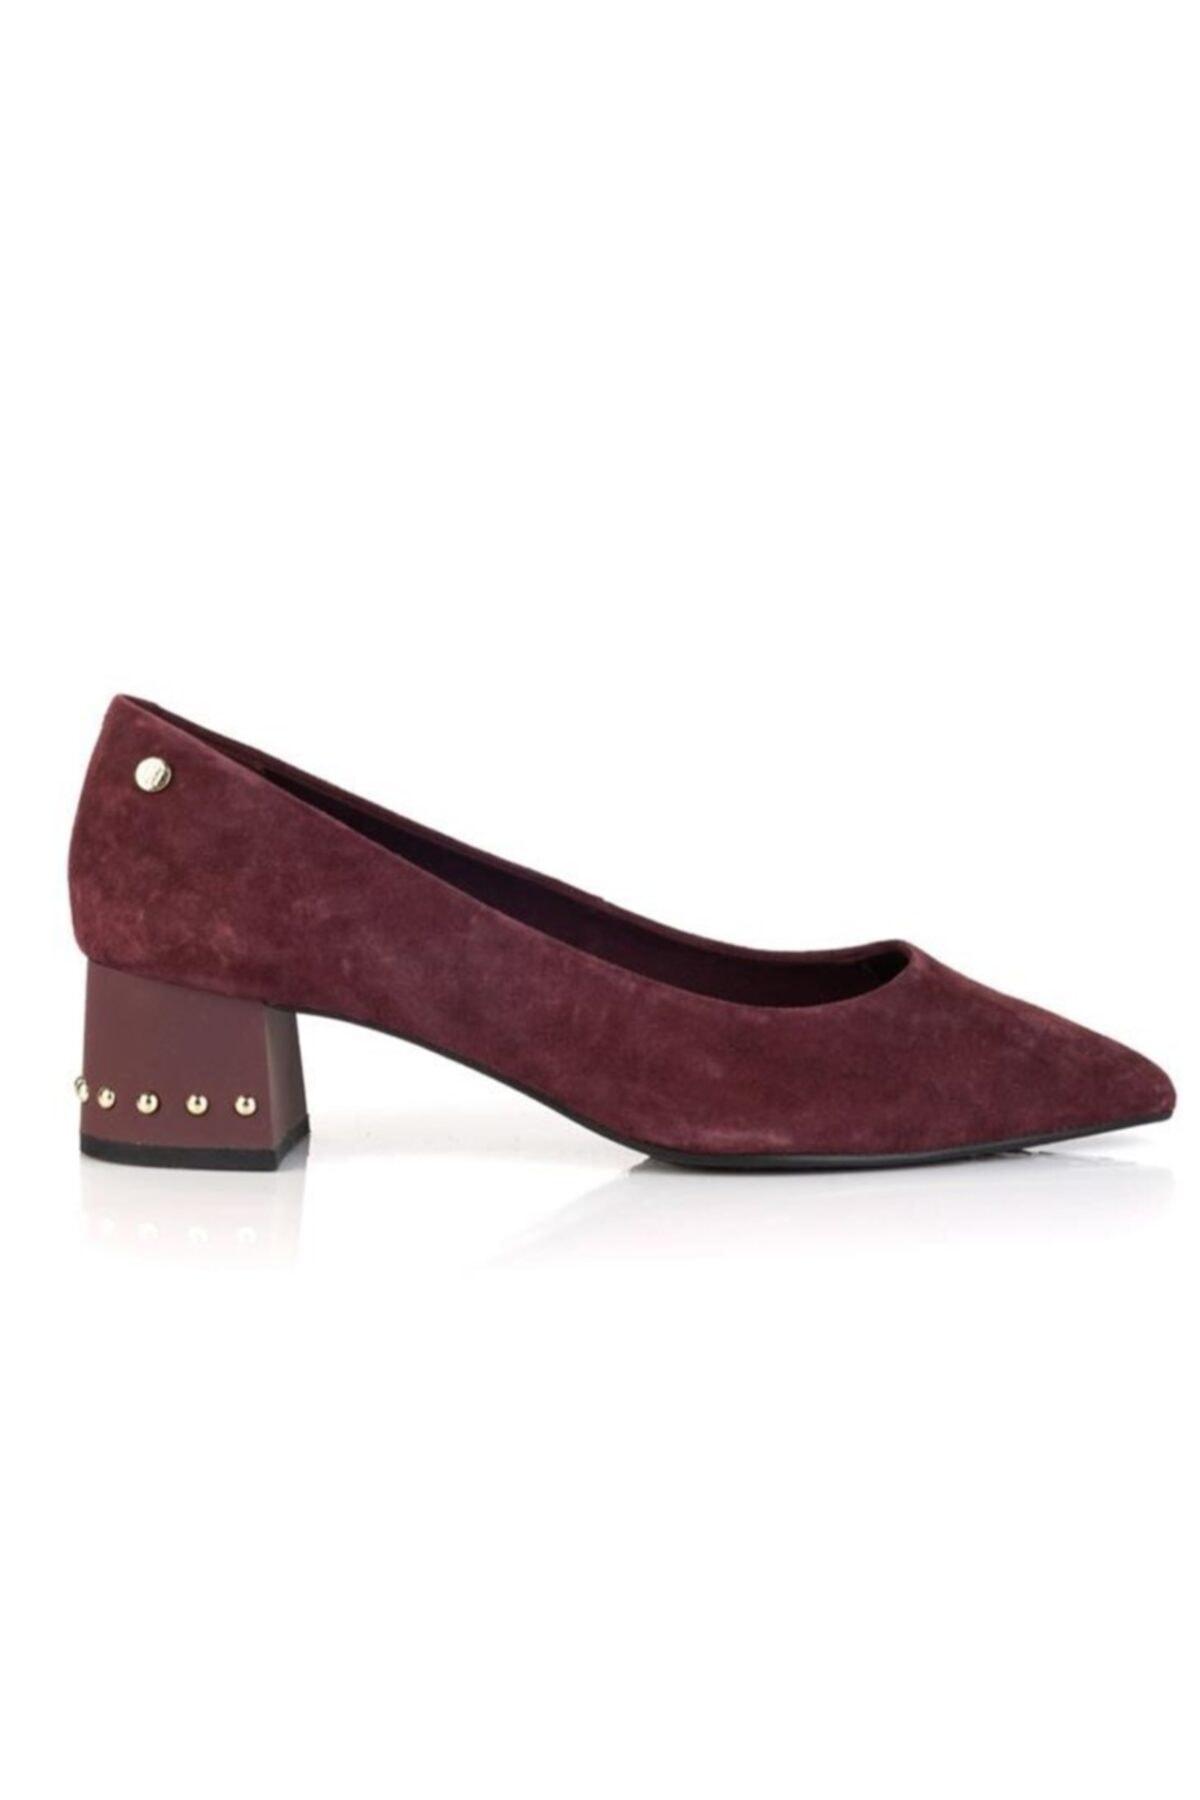 Tommy Hilfiger Kadın Bordo Topuklu Ayakkabı Fw0fw03609296 1